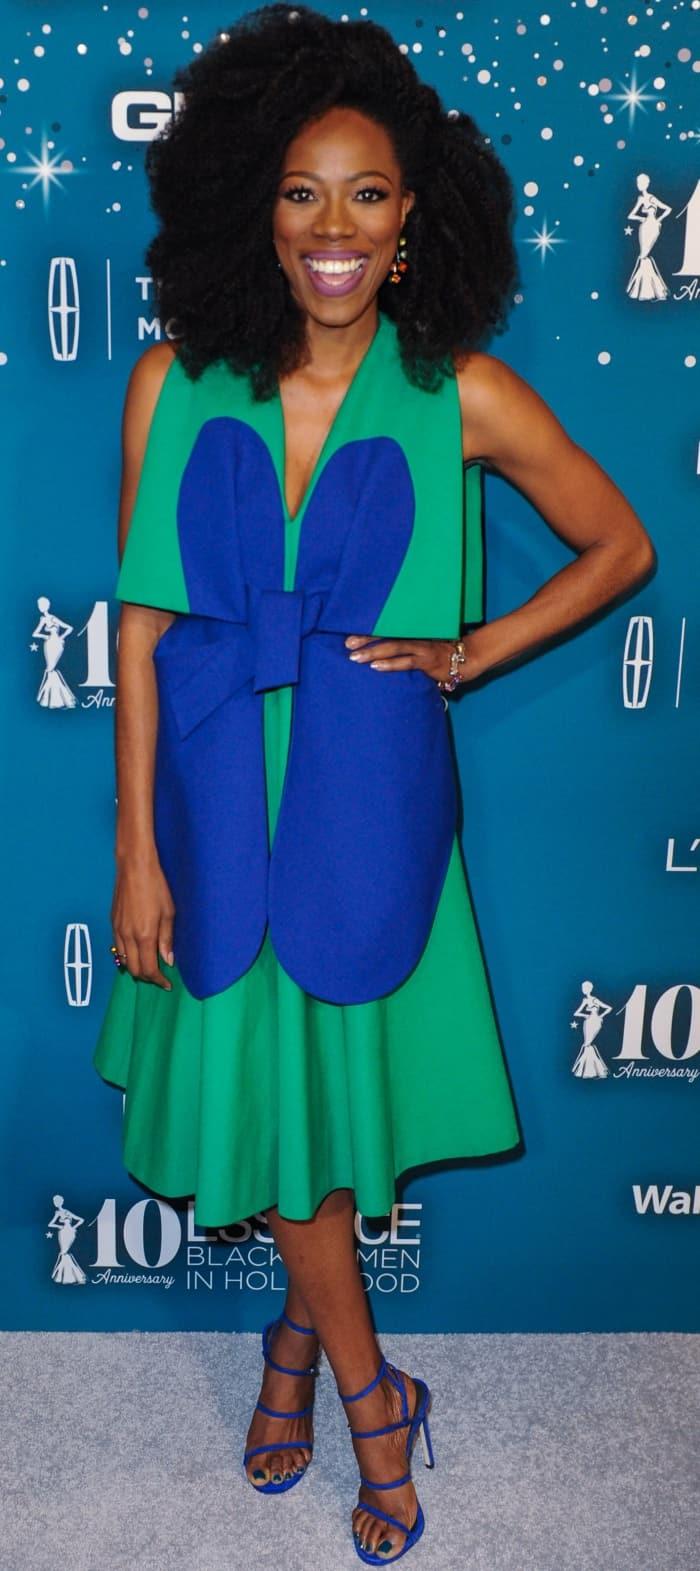 Yvonne Orji wearing a blue and green Delpozo dress and electric blue Stuart Weitzman sandals